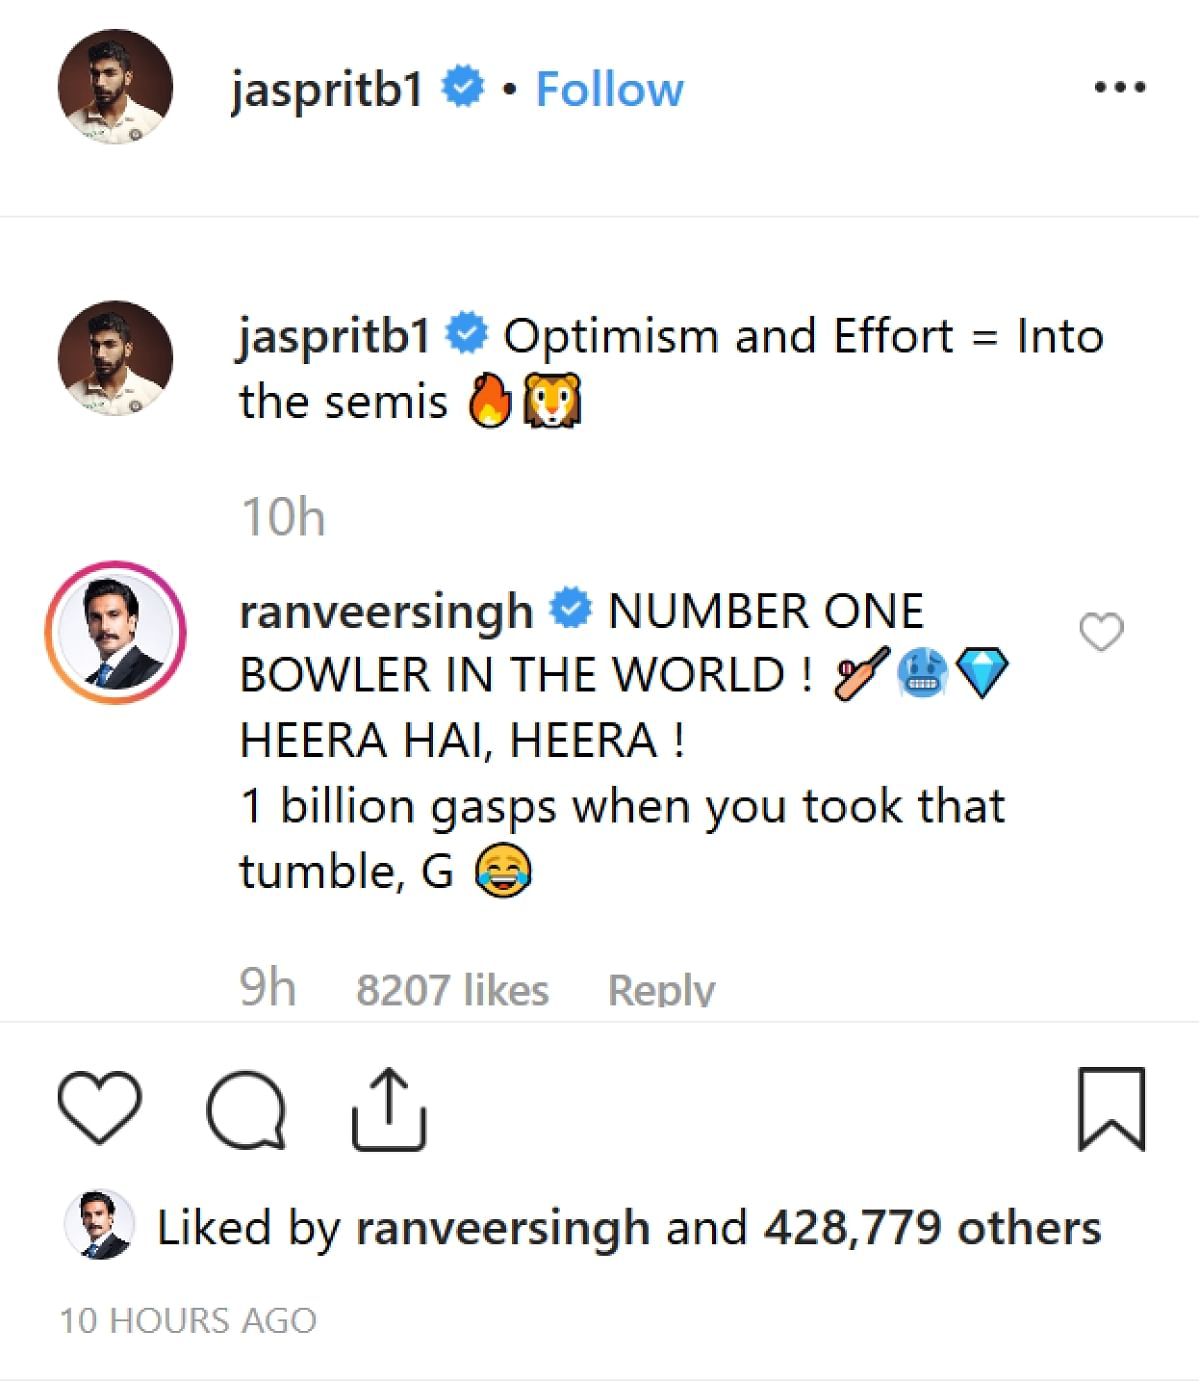 Ranveer Singh comments on Jashprit Bumrah